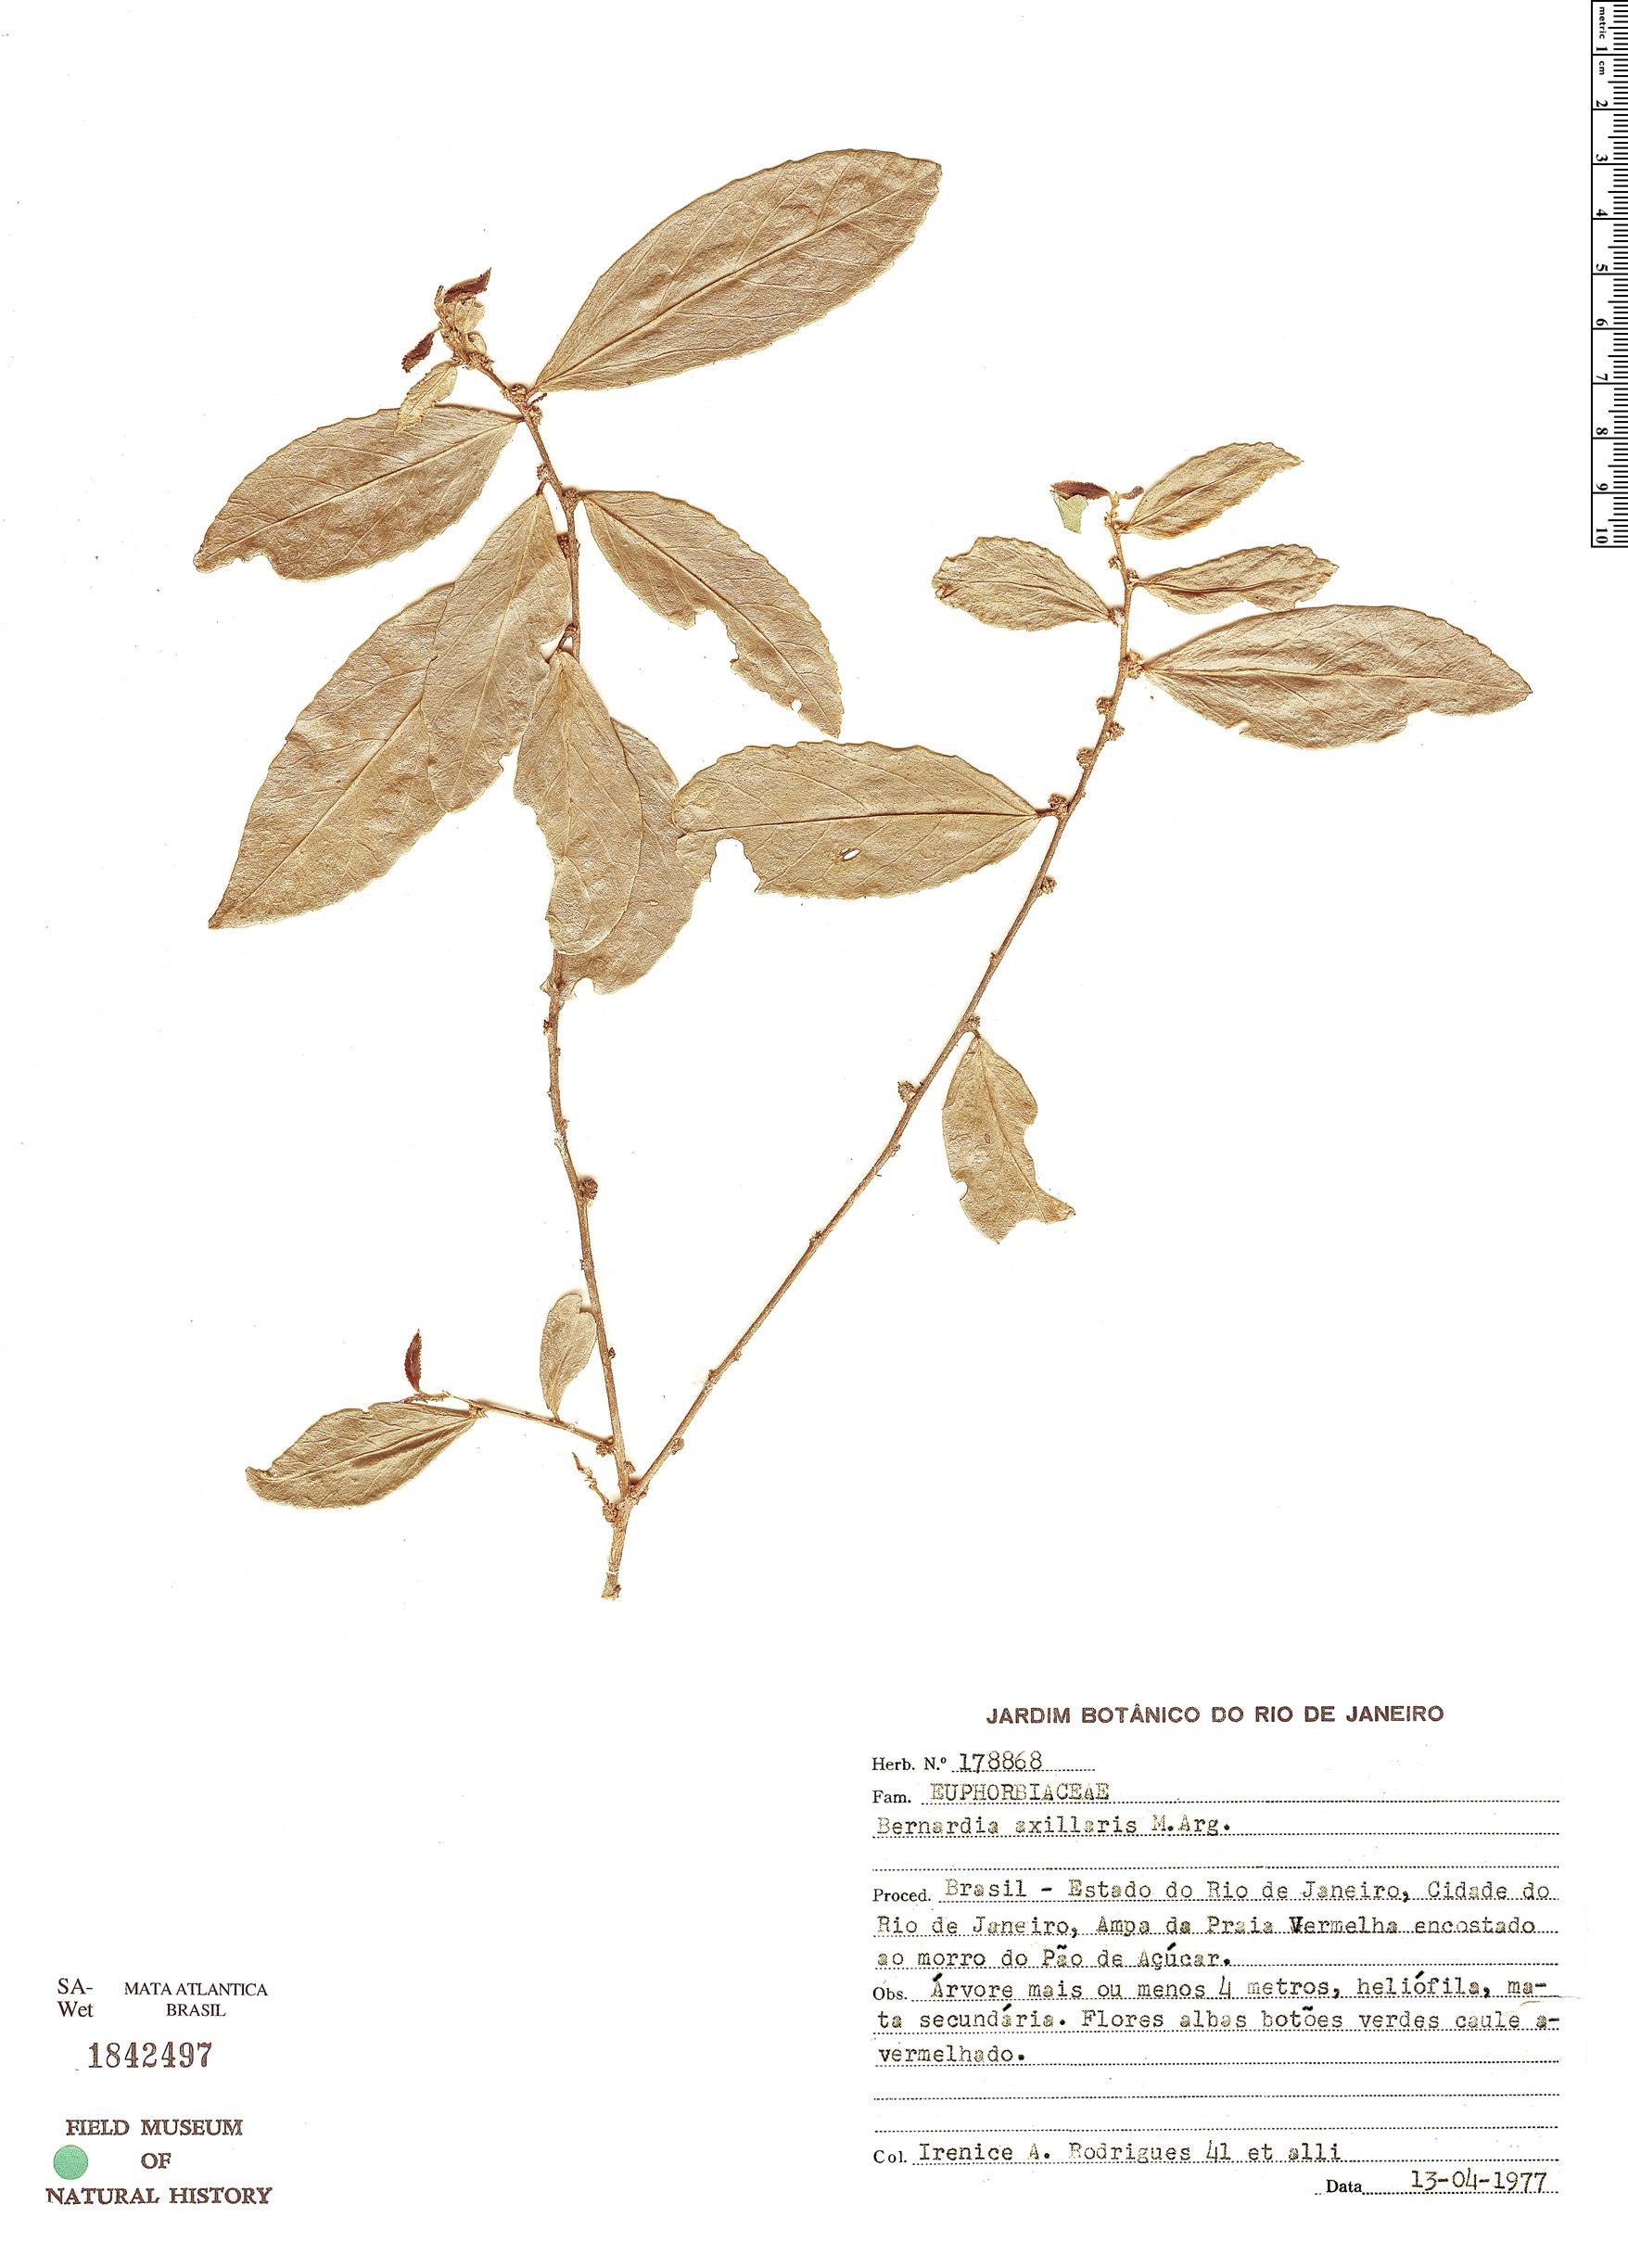 Specimen: Bernardia axillaris